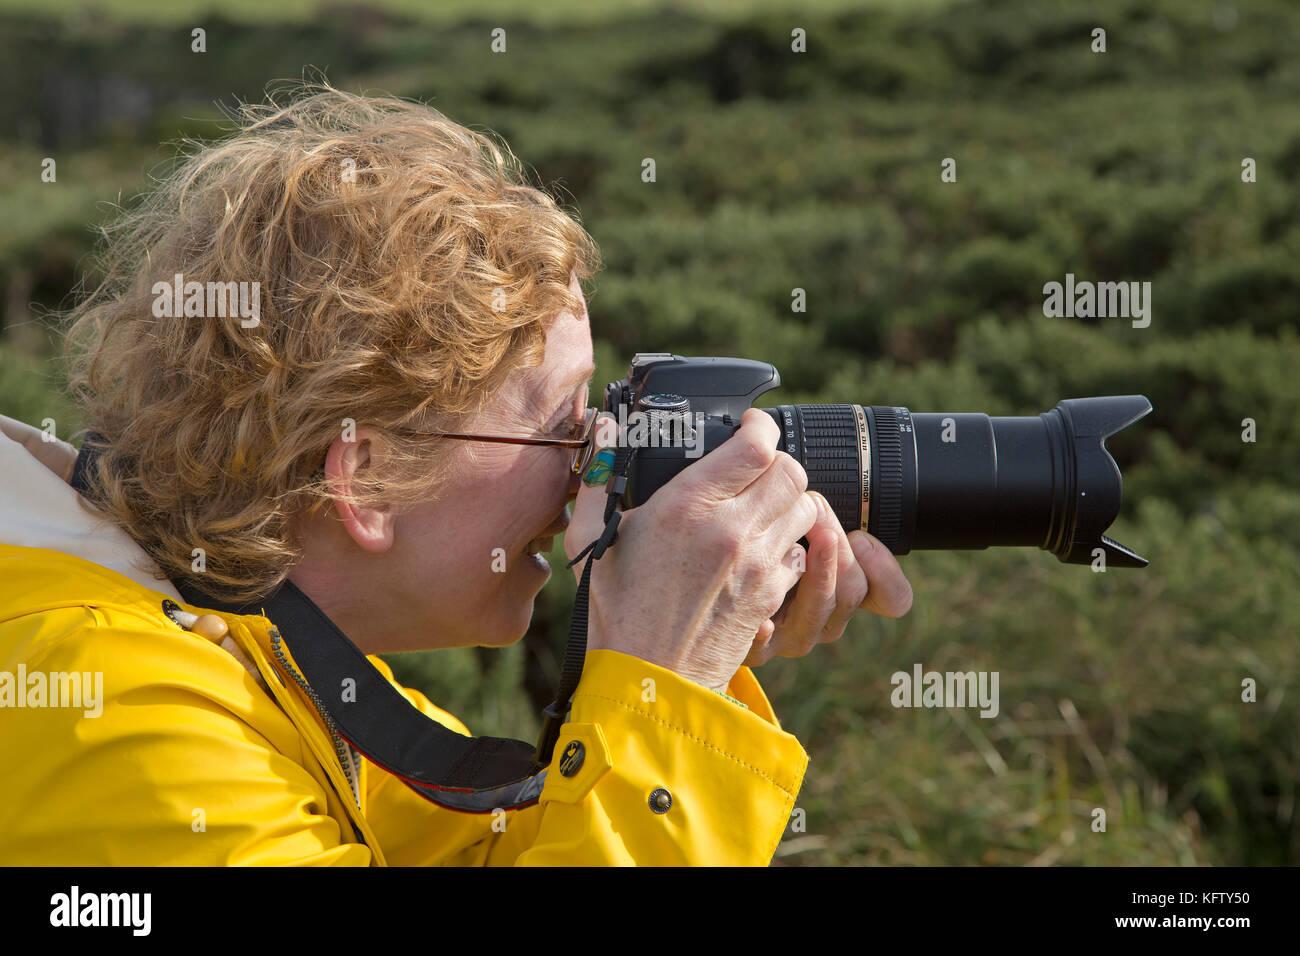 woman taking photos, Giants Causeway, Bushmills, Co. Antrim, Northern Ireland - Stock Image